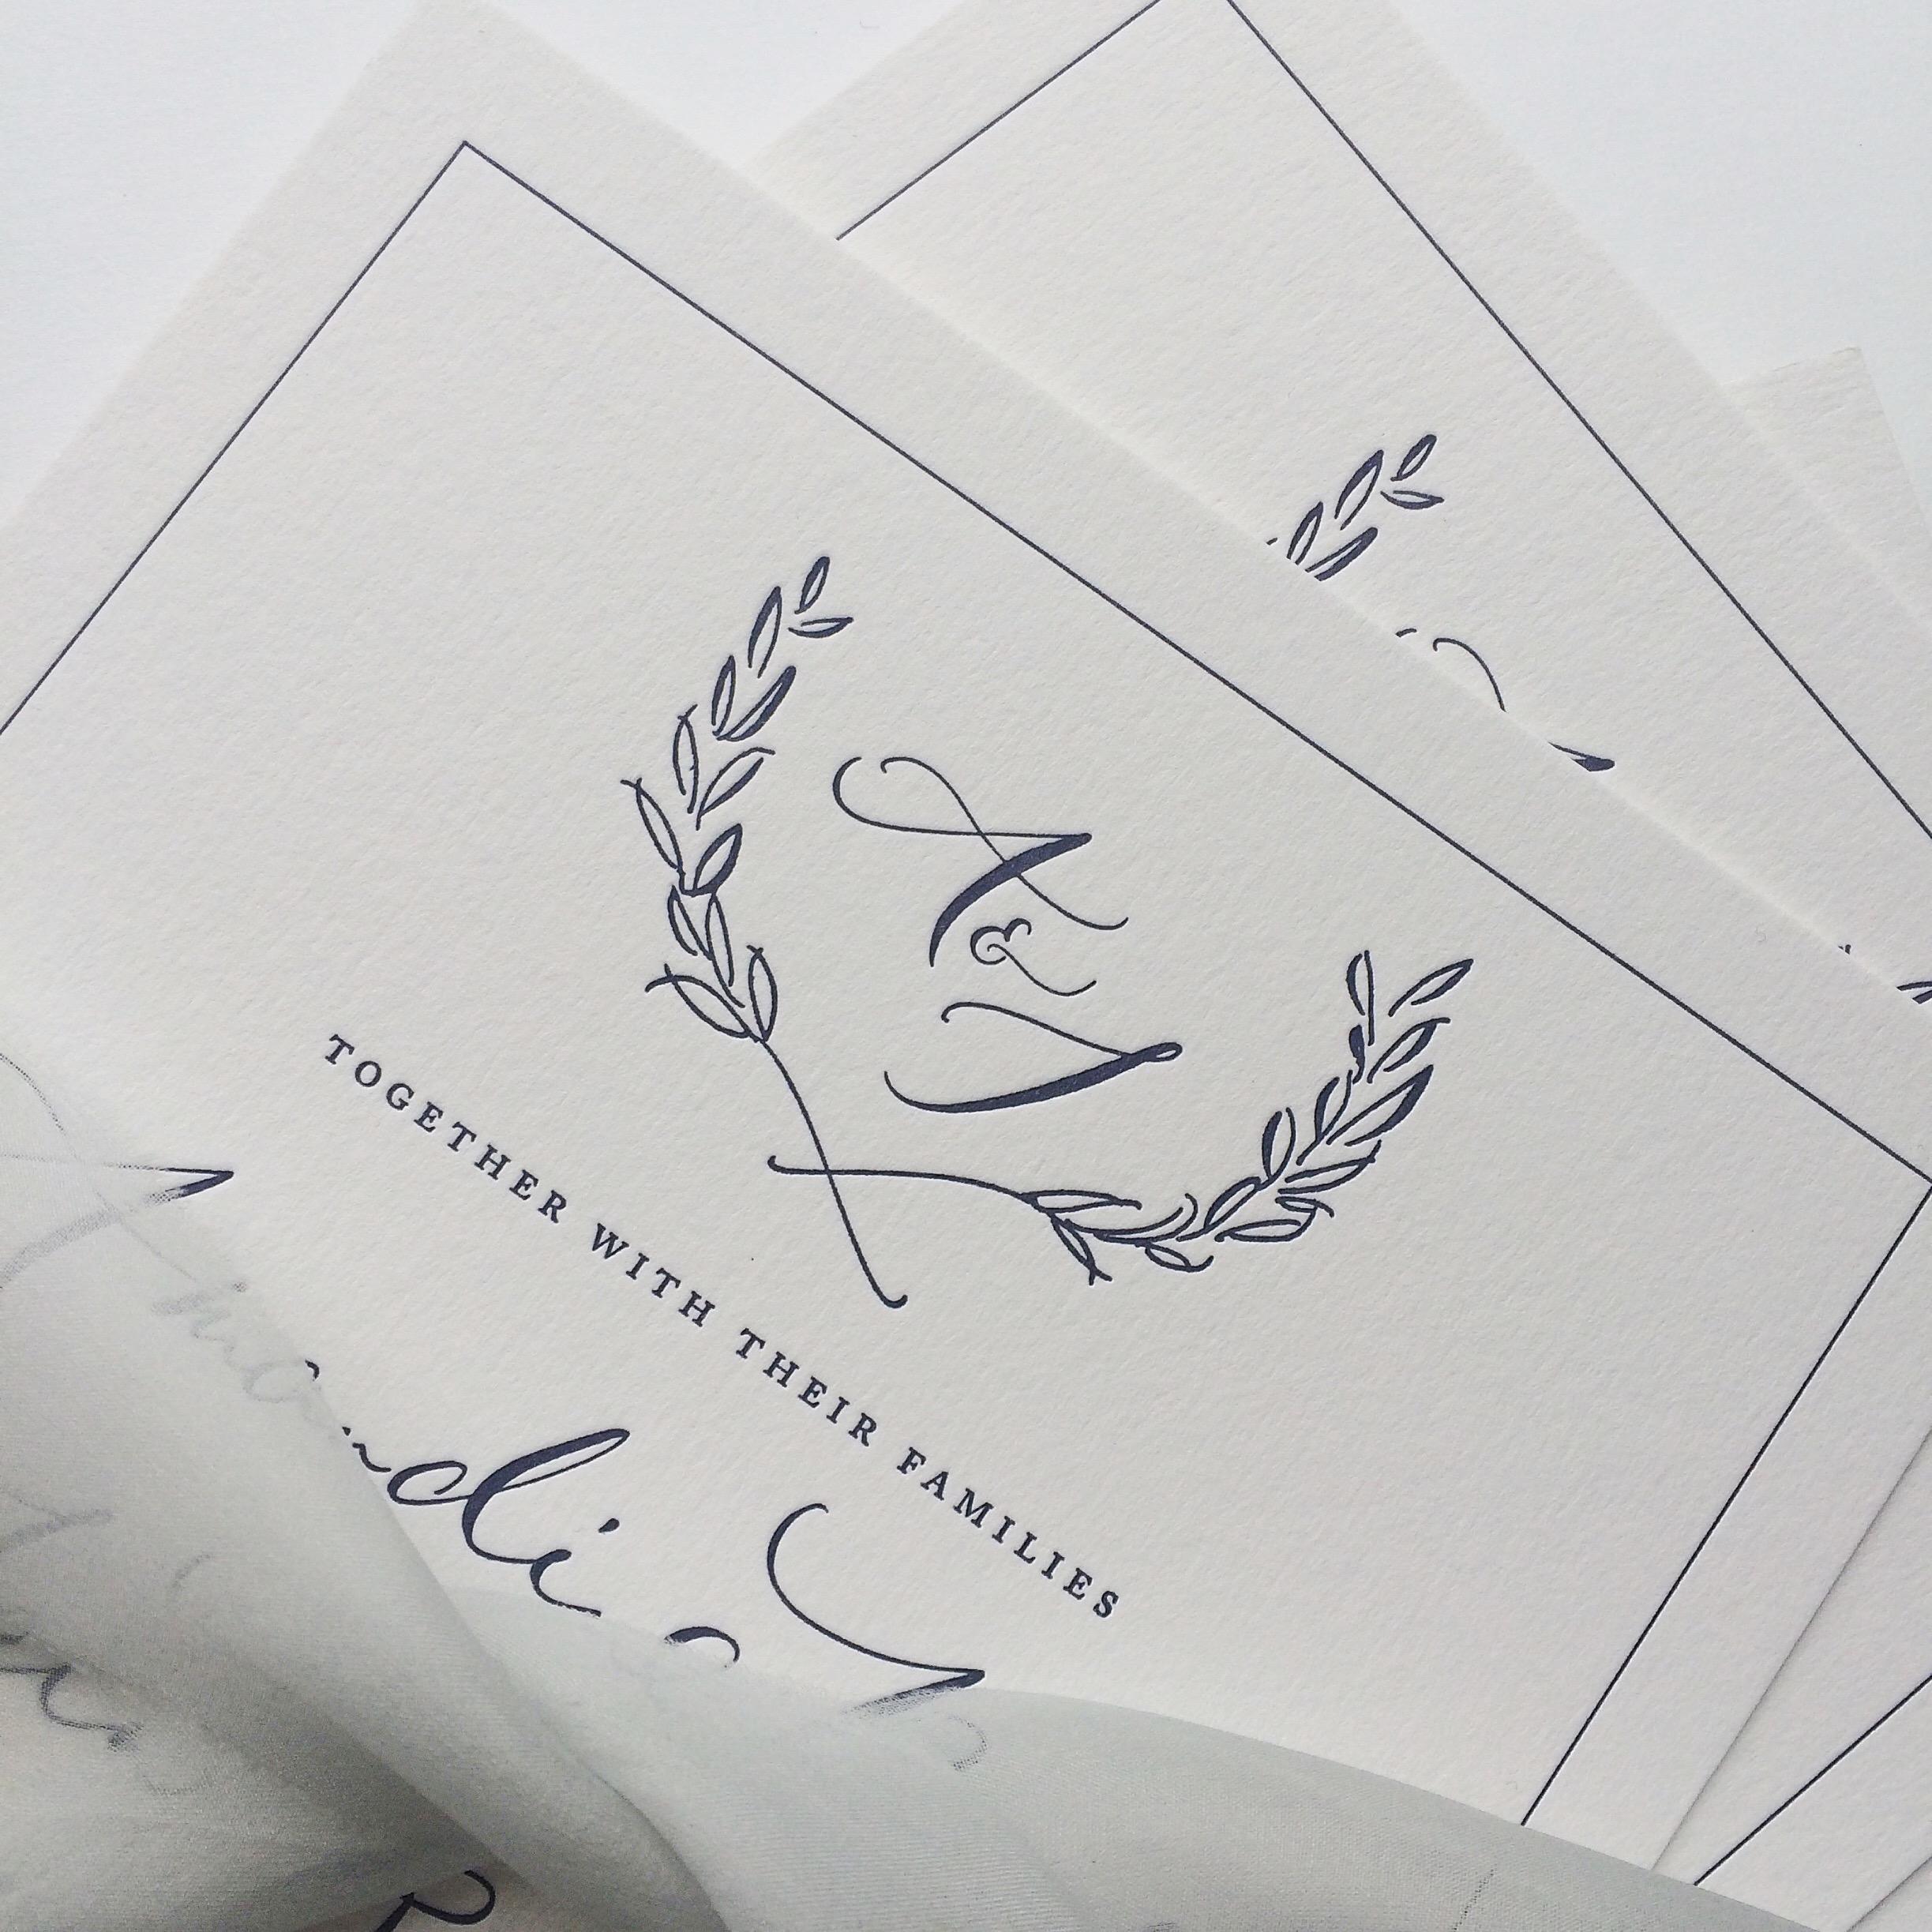 Letterpress invitations for Amandine & Iain's Tuscan wedding